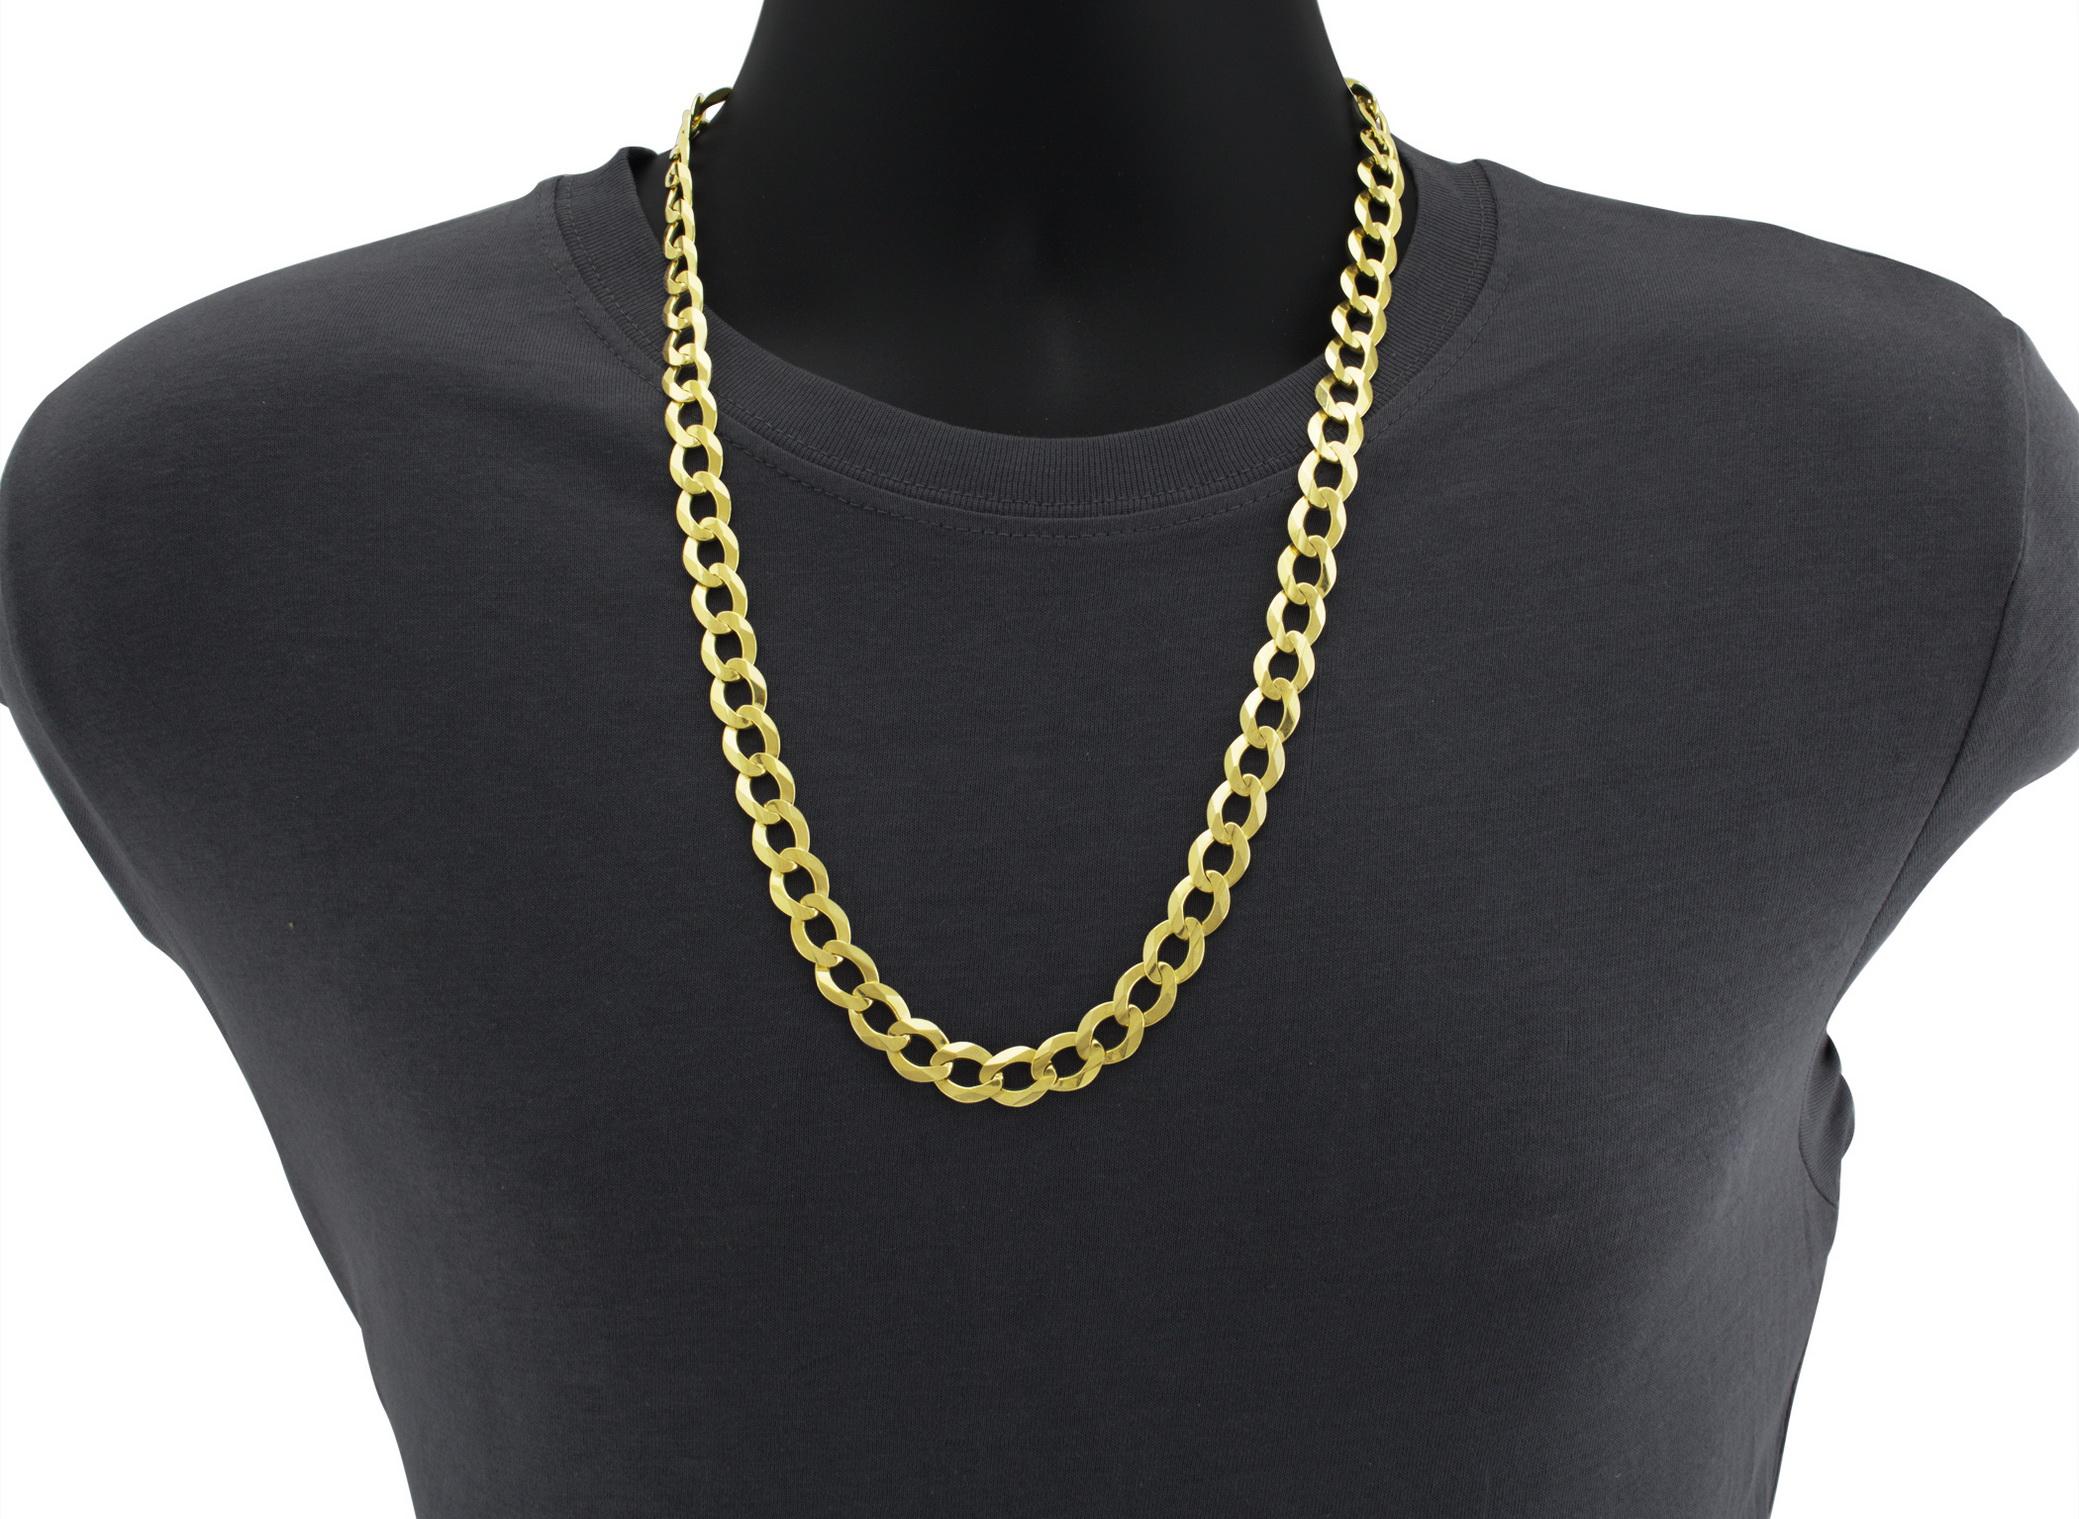 10K-Solid-Yellow-Gold-2mm-12mm-Cuban-Curb-Link-Chain-Bracelet-Men-Women-7-034-8-034-9-034 thumbnail 9